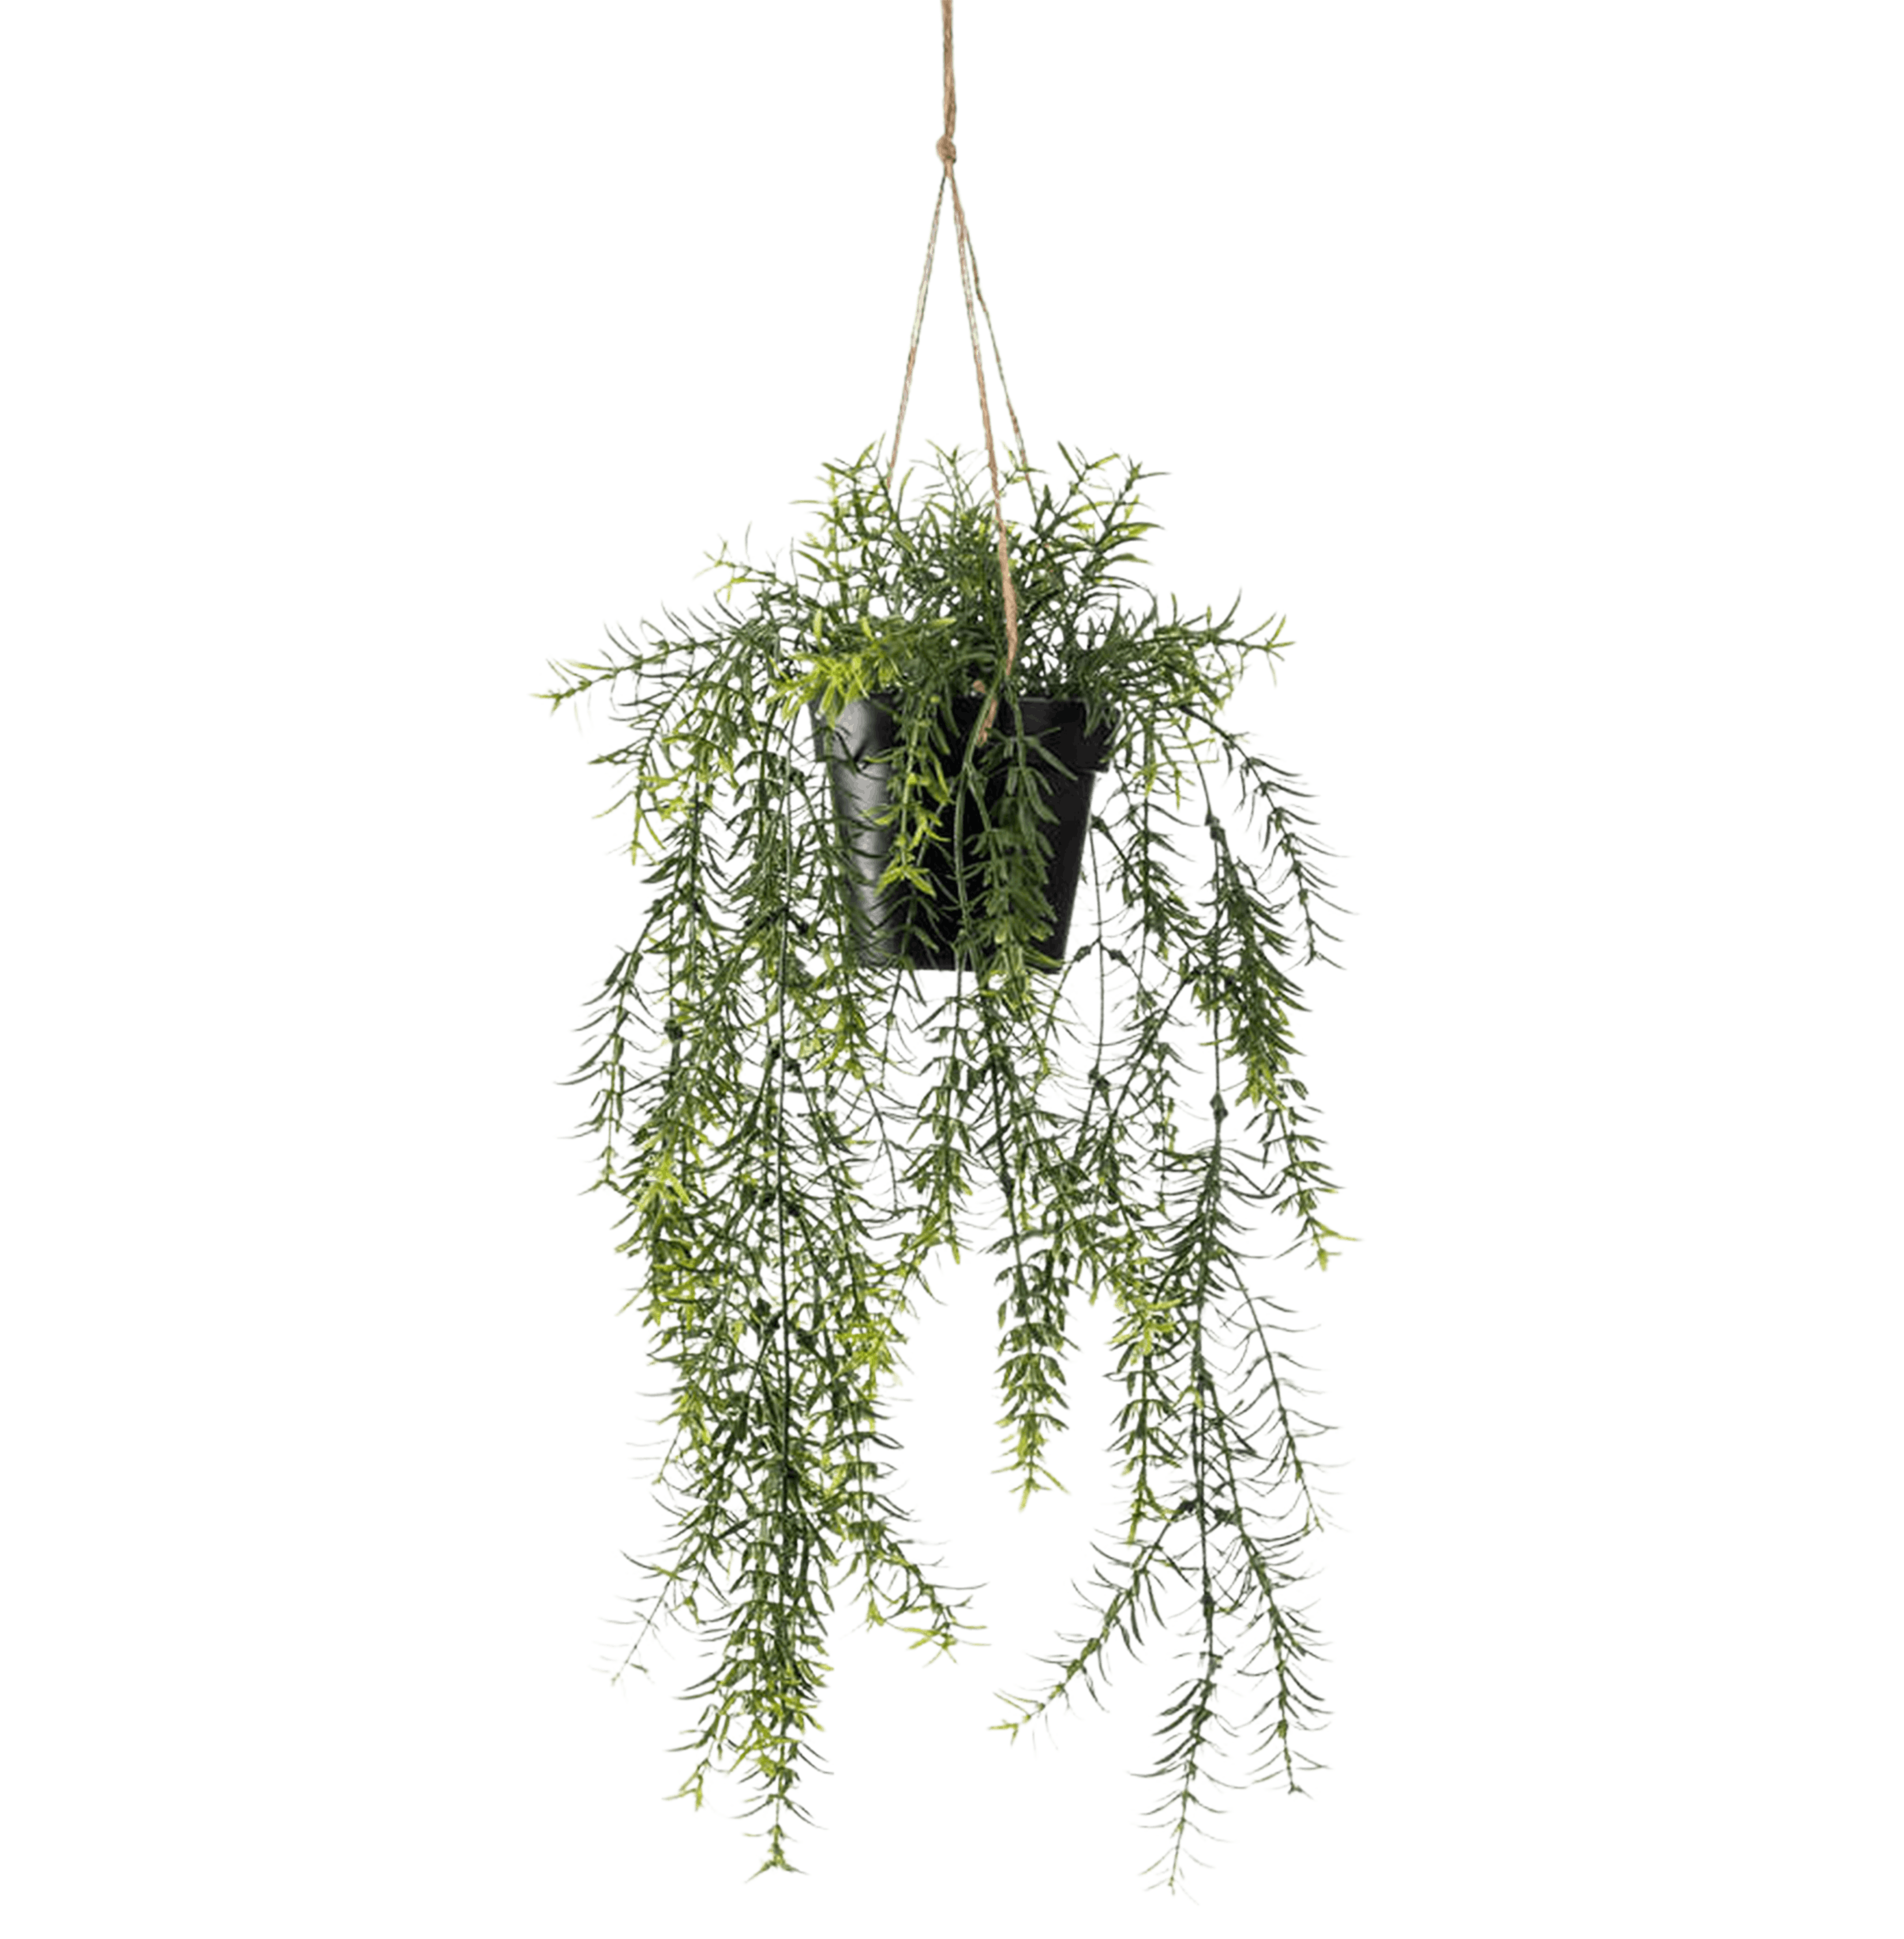 Artificial hanging asparagus